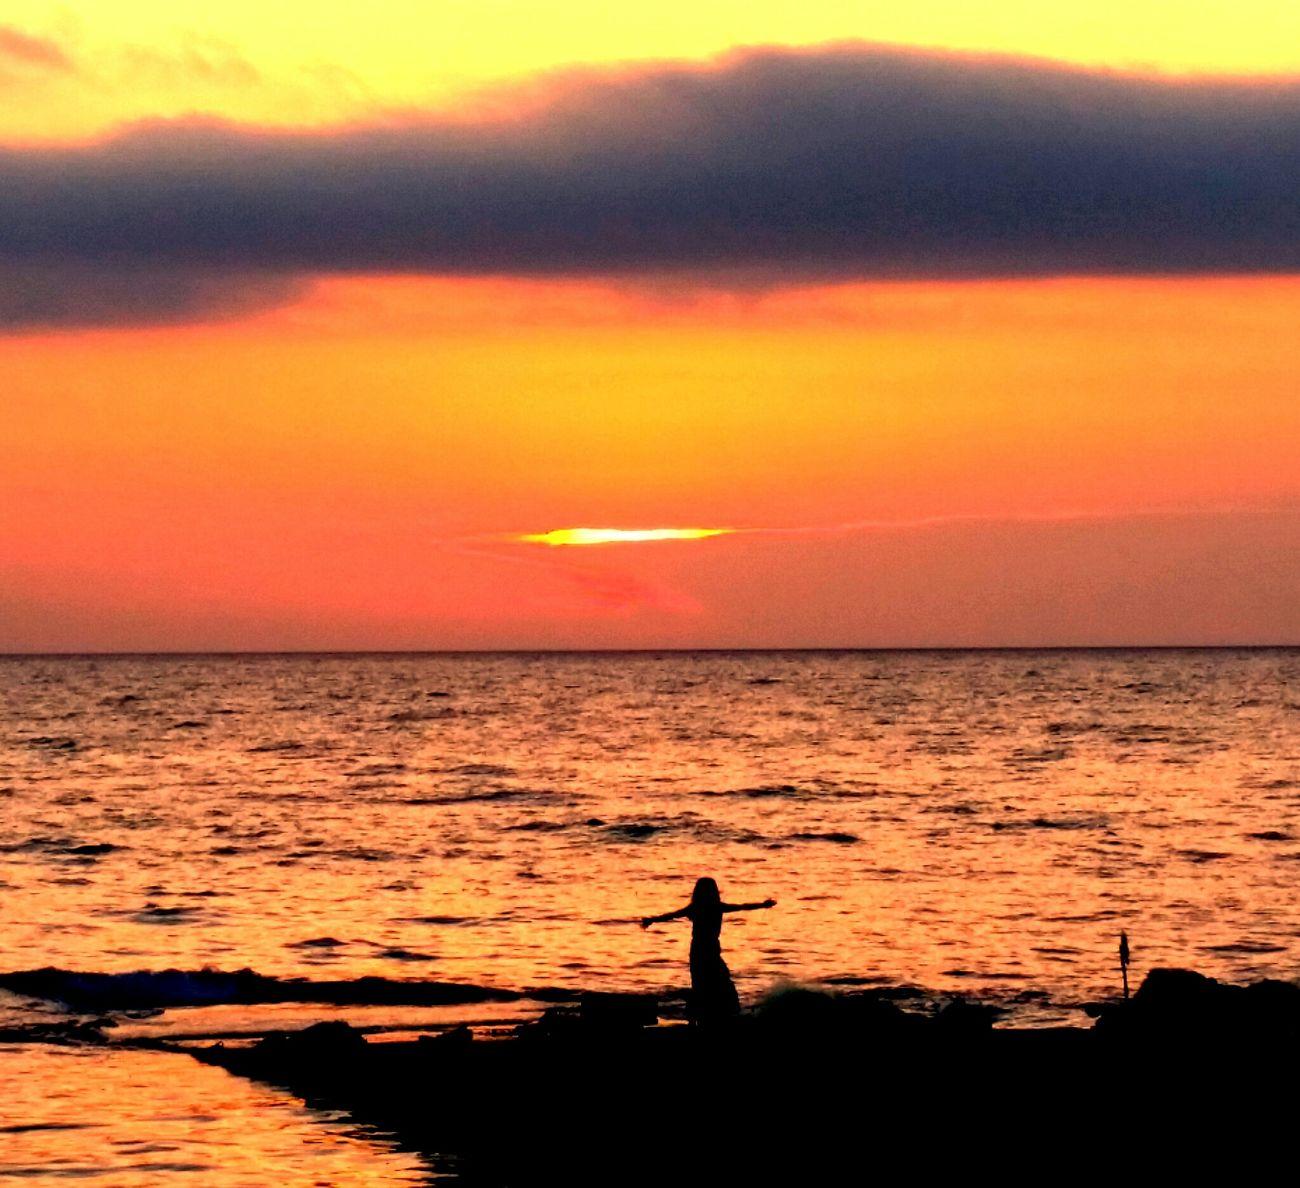 Sunset_collection ıstanbul, Turkey Sunset Silhouettes Sunset #sun #clouds #skylovers #sky #nature #beautifulinnature #naturalbeauty #photography #landscape